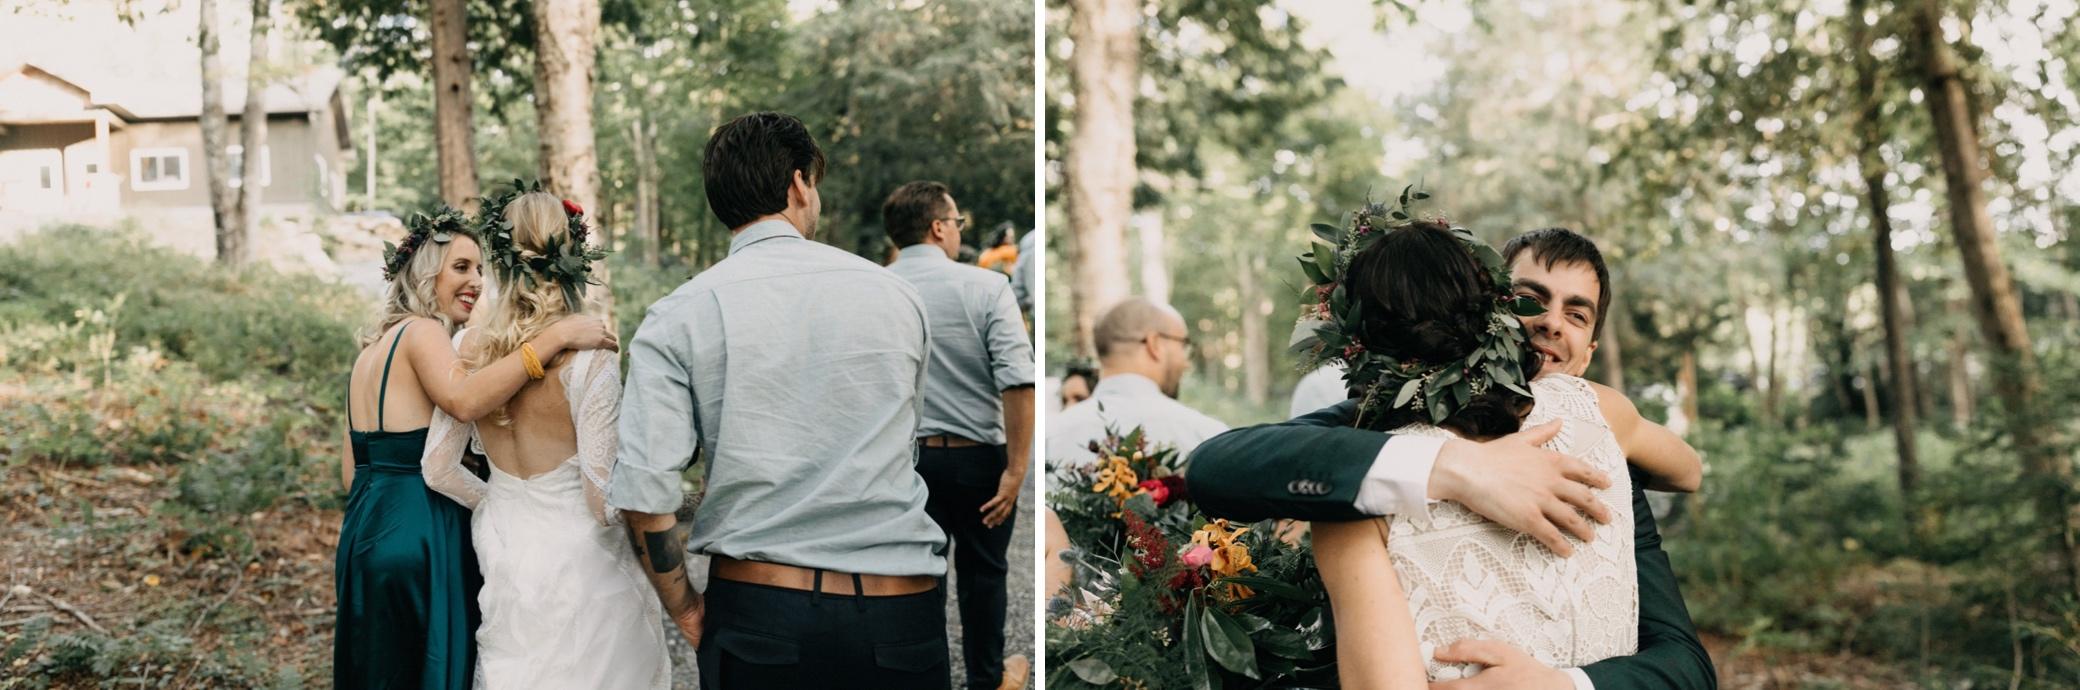 108_Huntsville Wedding  (498 of 689)_Huntsville Wedding  (497 of 689).jpg